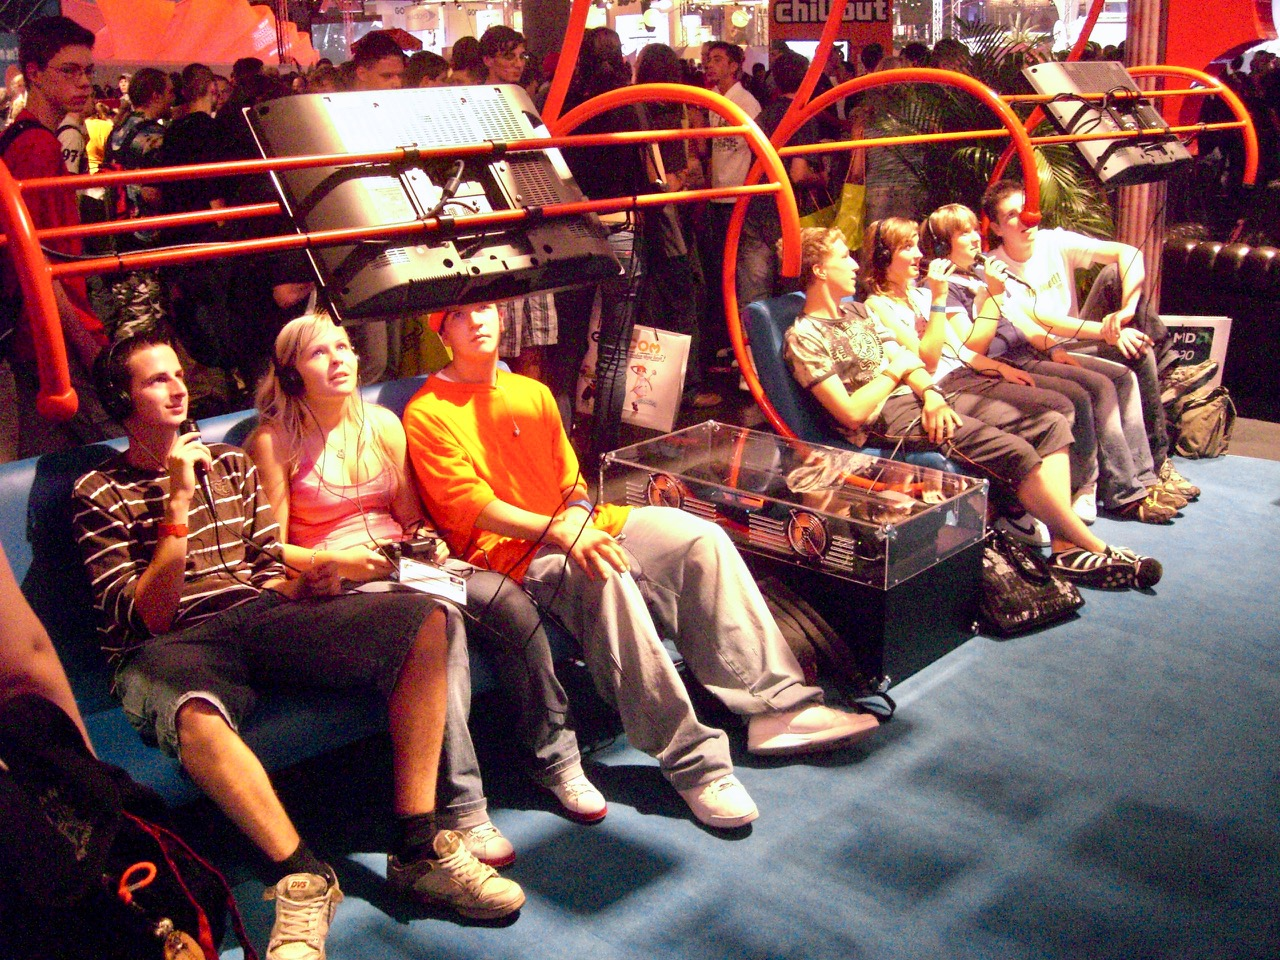 SingStar vereint Amateuer-Stars auf dem Sofa. (Bild: André Eymann)